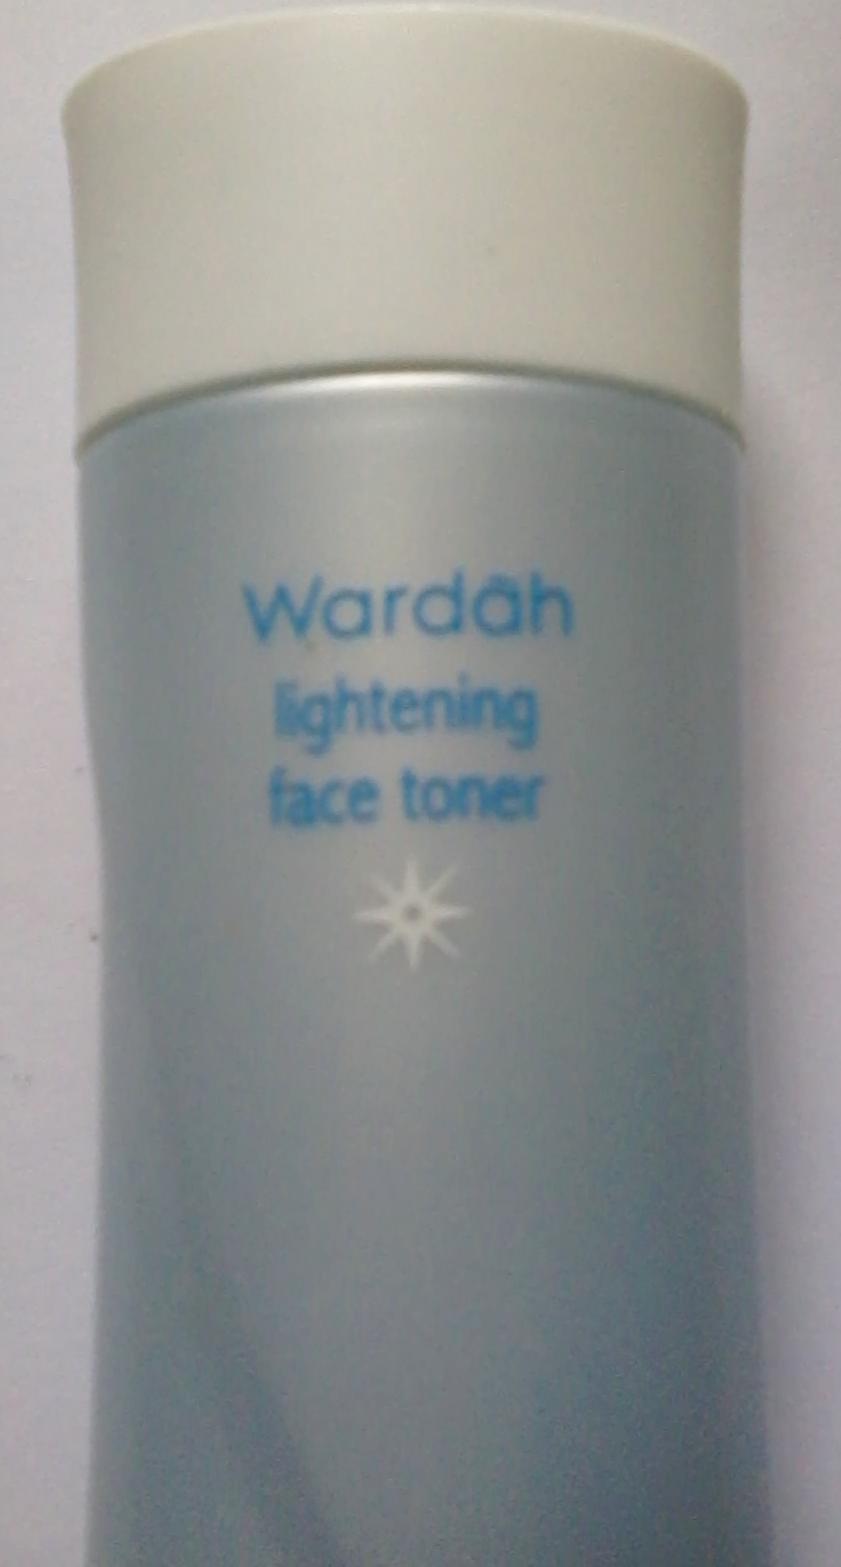 On The Road Belajar Menulis Wardah Lightening Series Face Toner 150 Ml